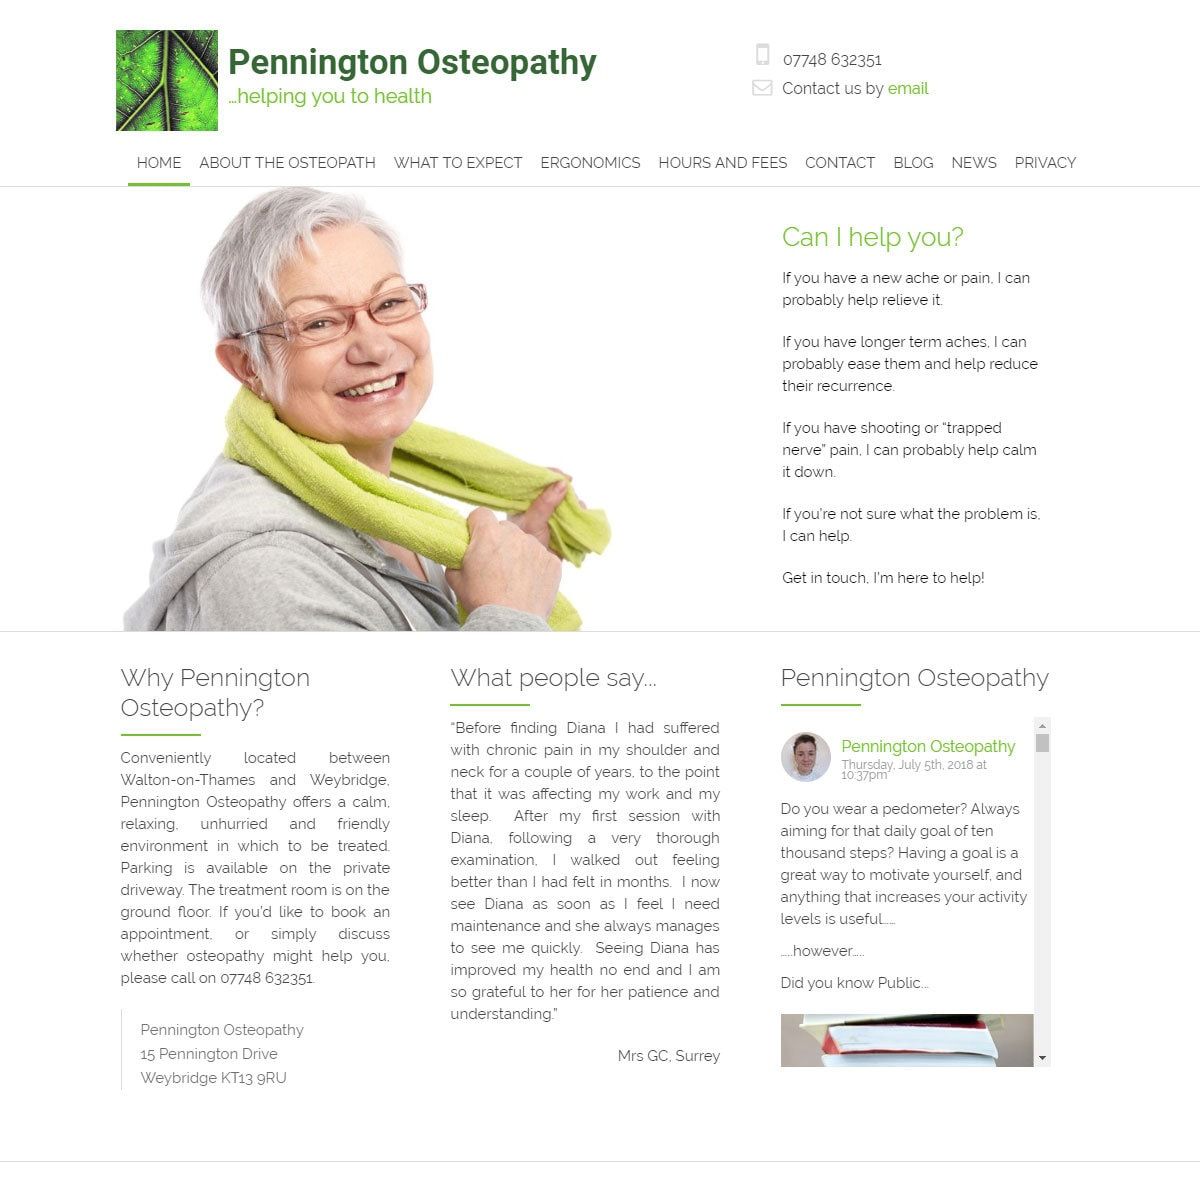 penningtonosteopathy